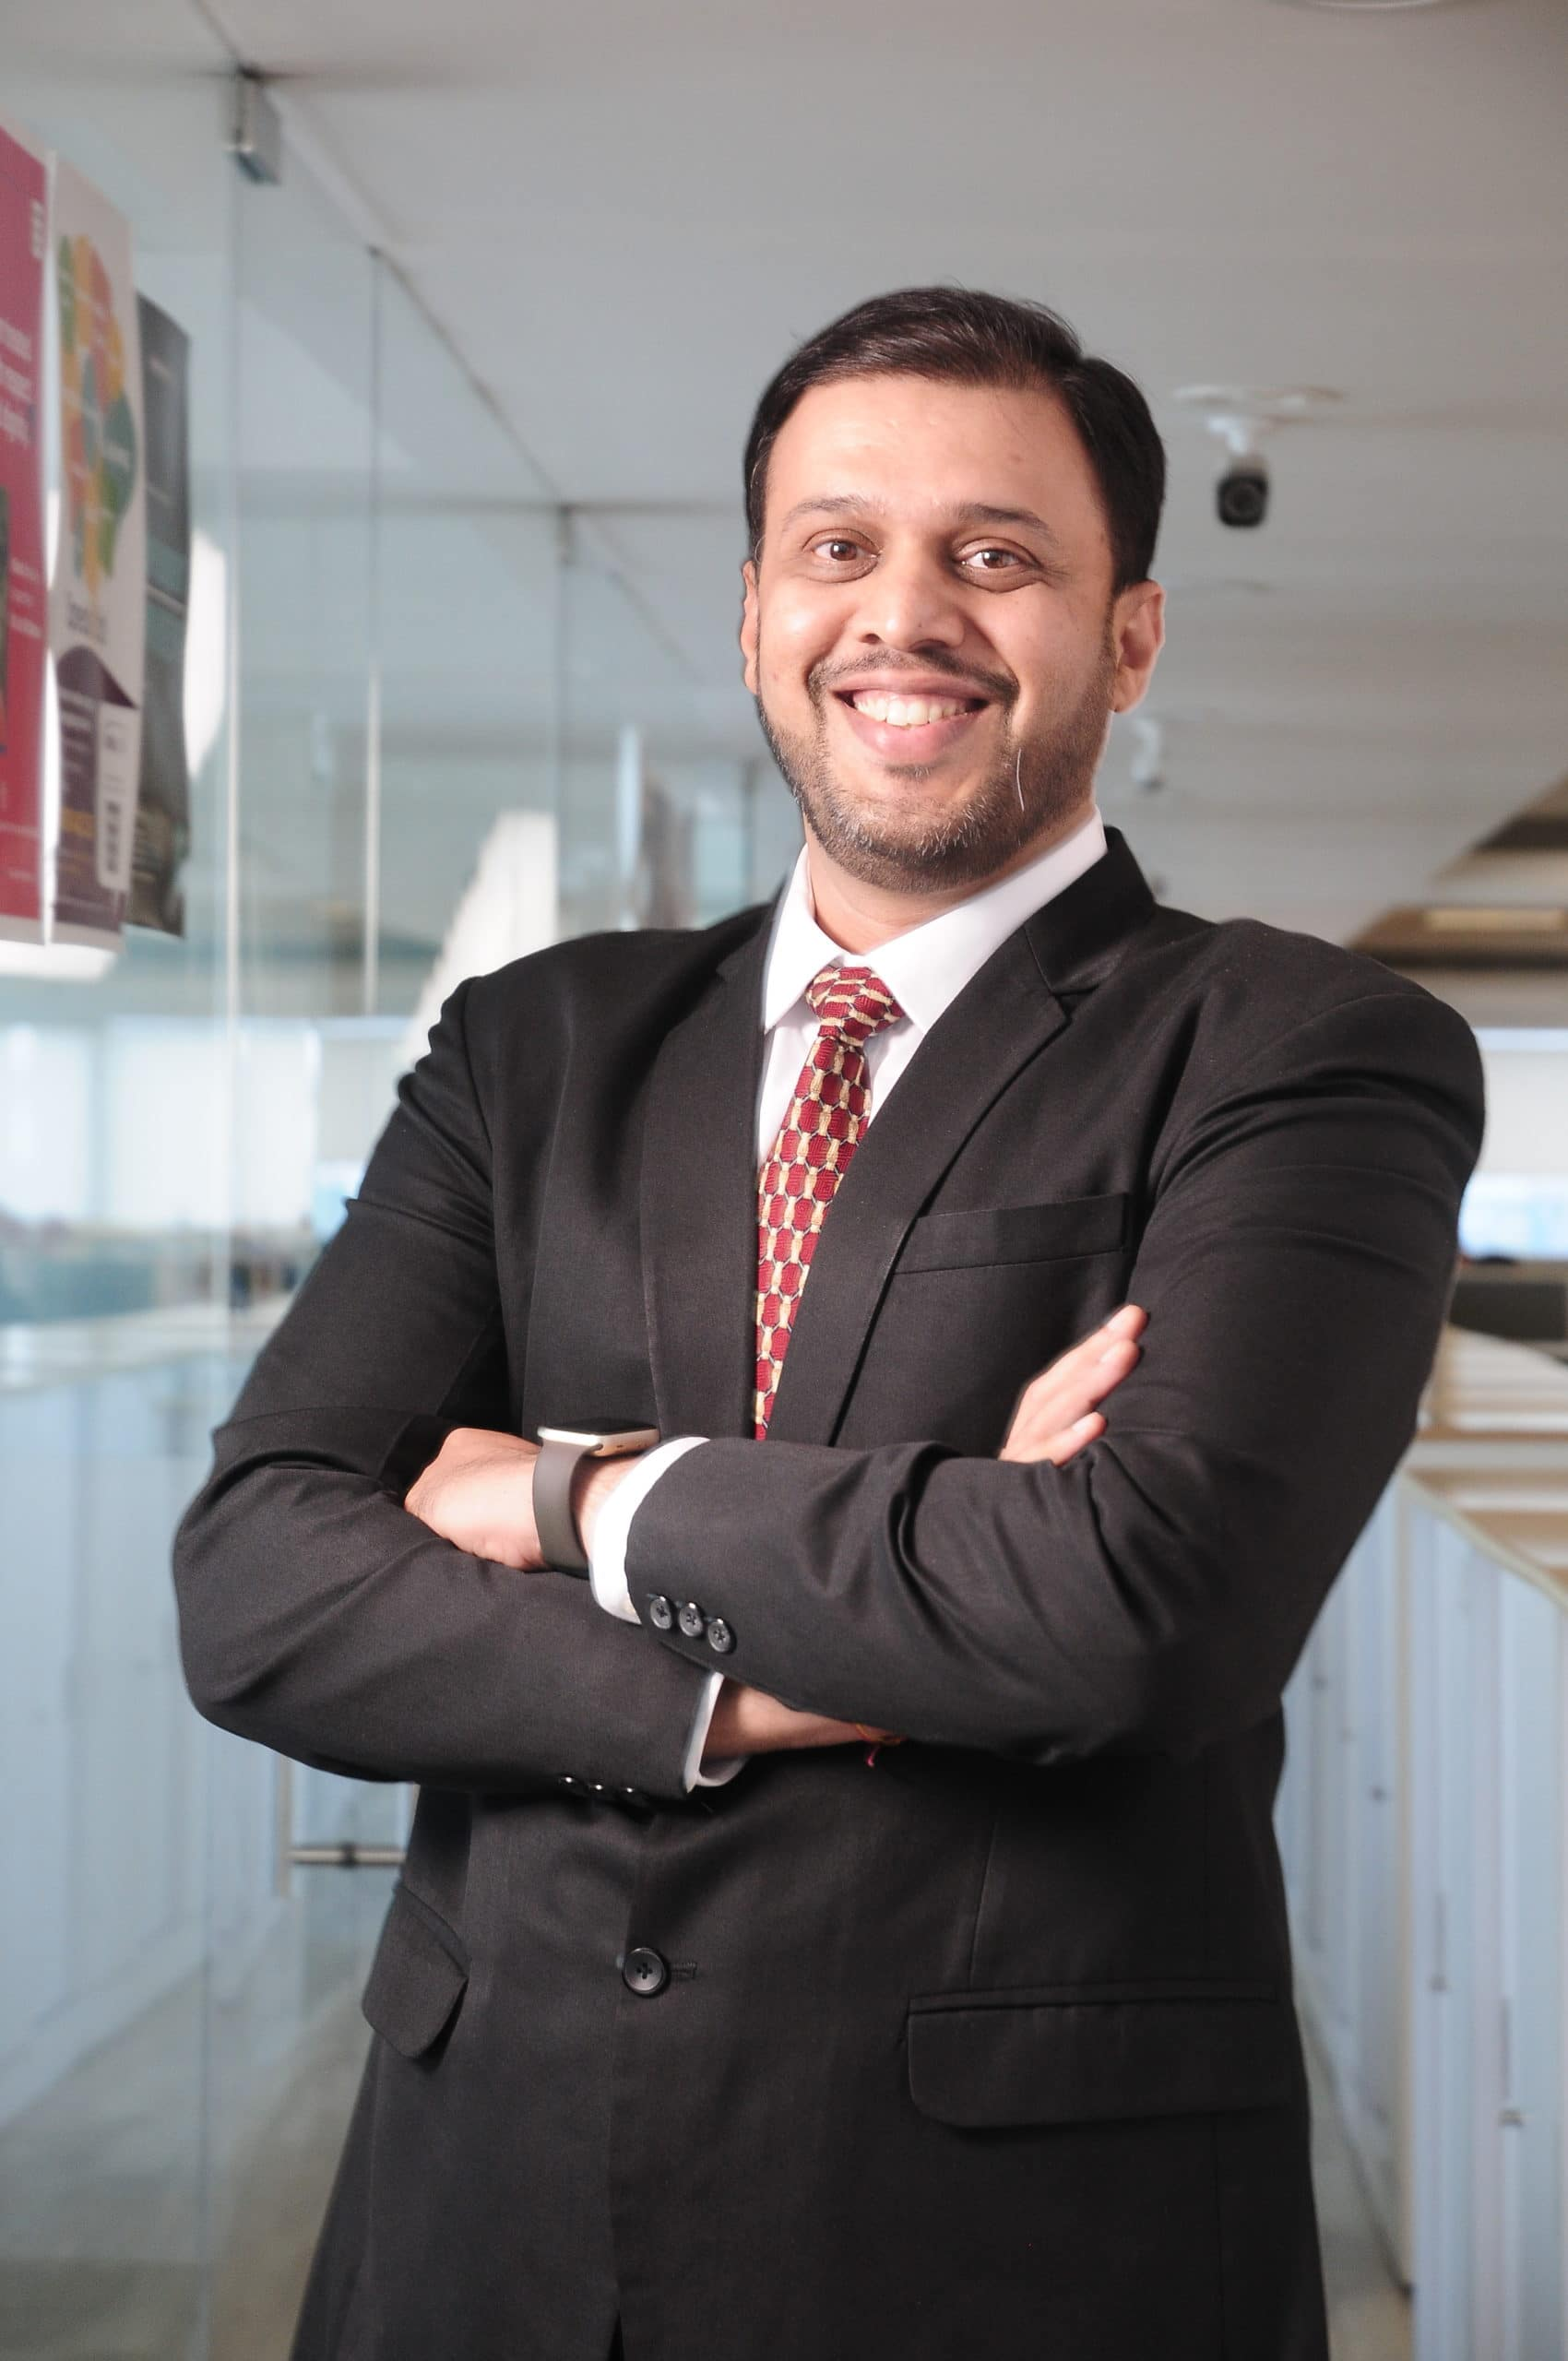 Anand Bhadkamkar, CEO, Dentsu Aegis Network India